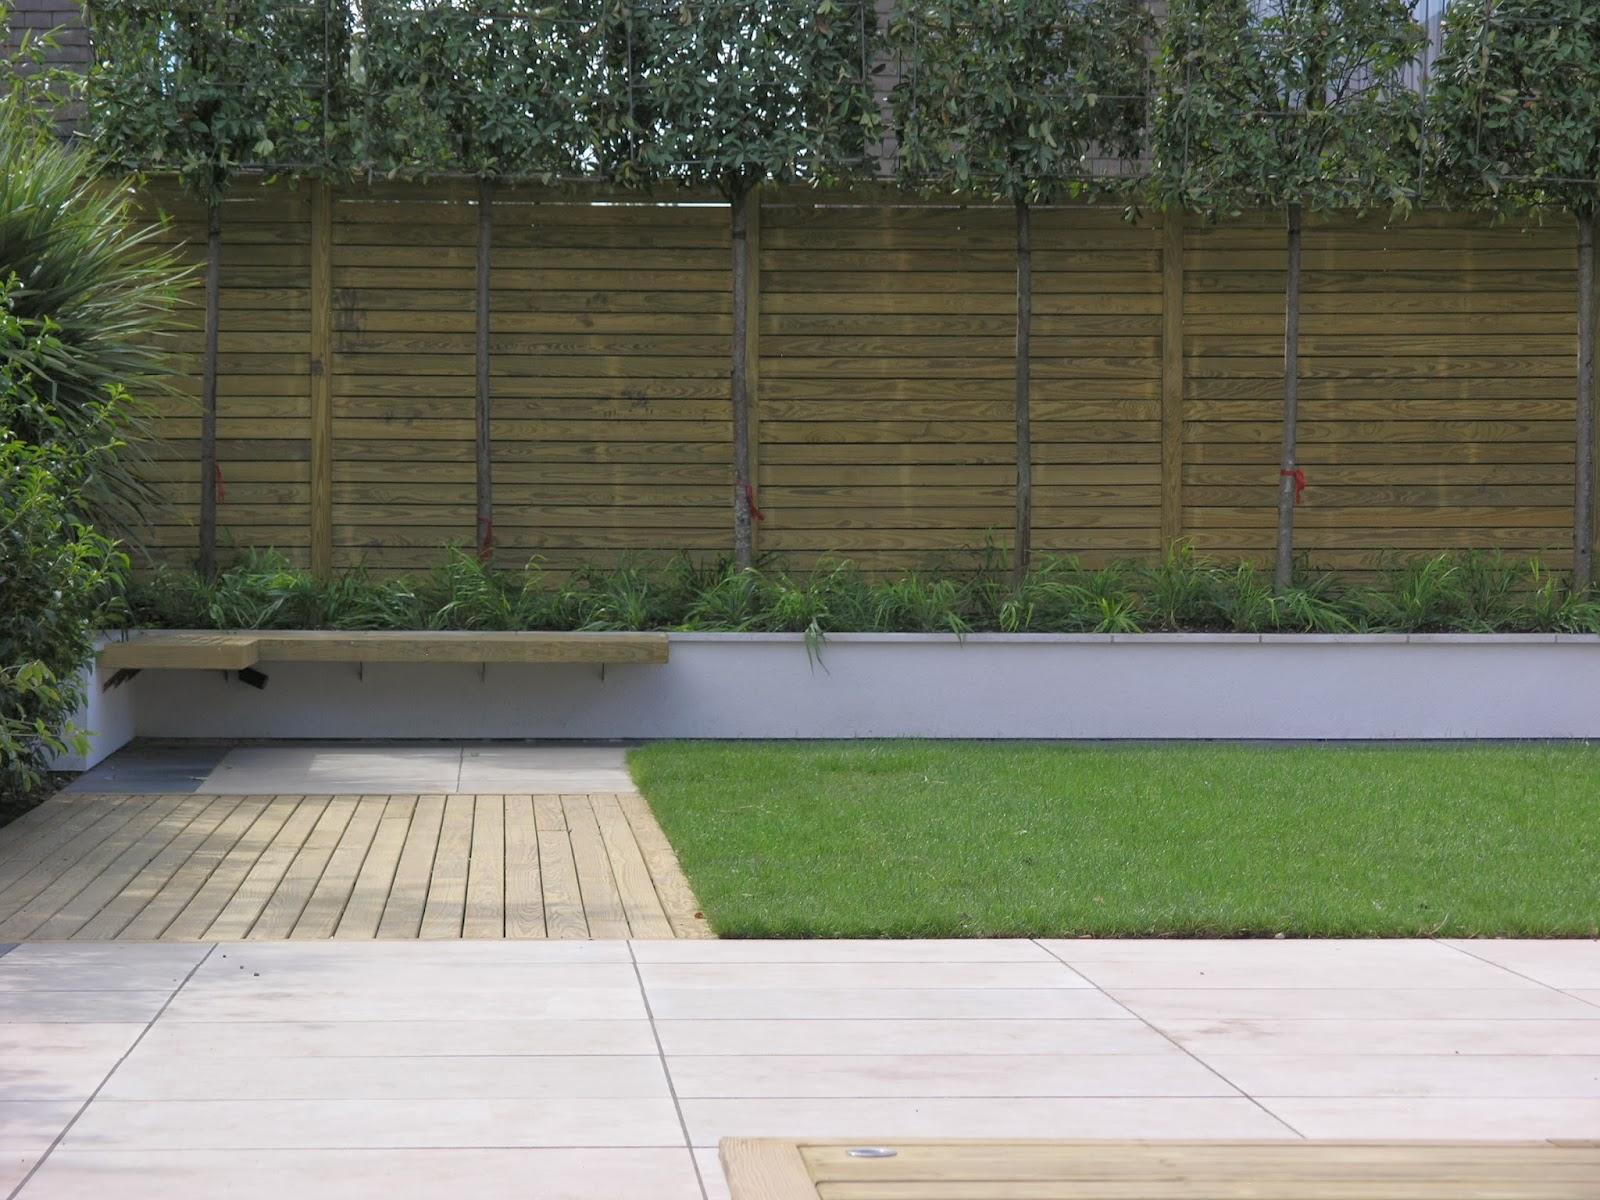 David Keegans Garden Design Blog: December 2013